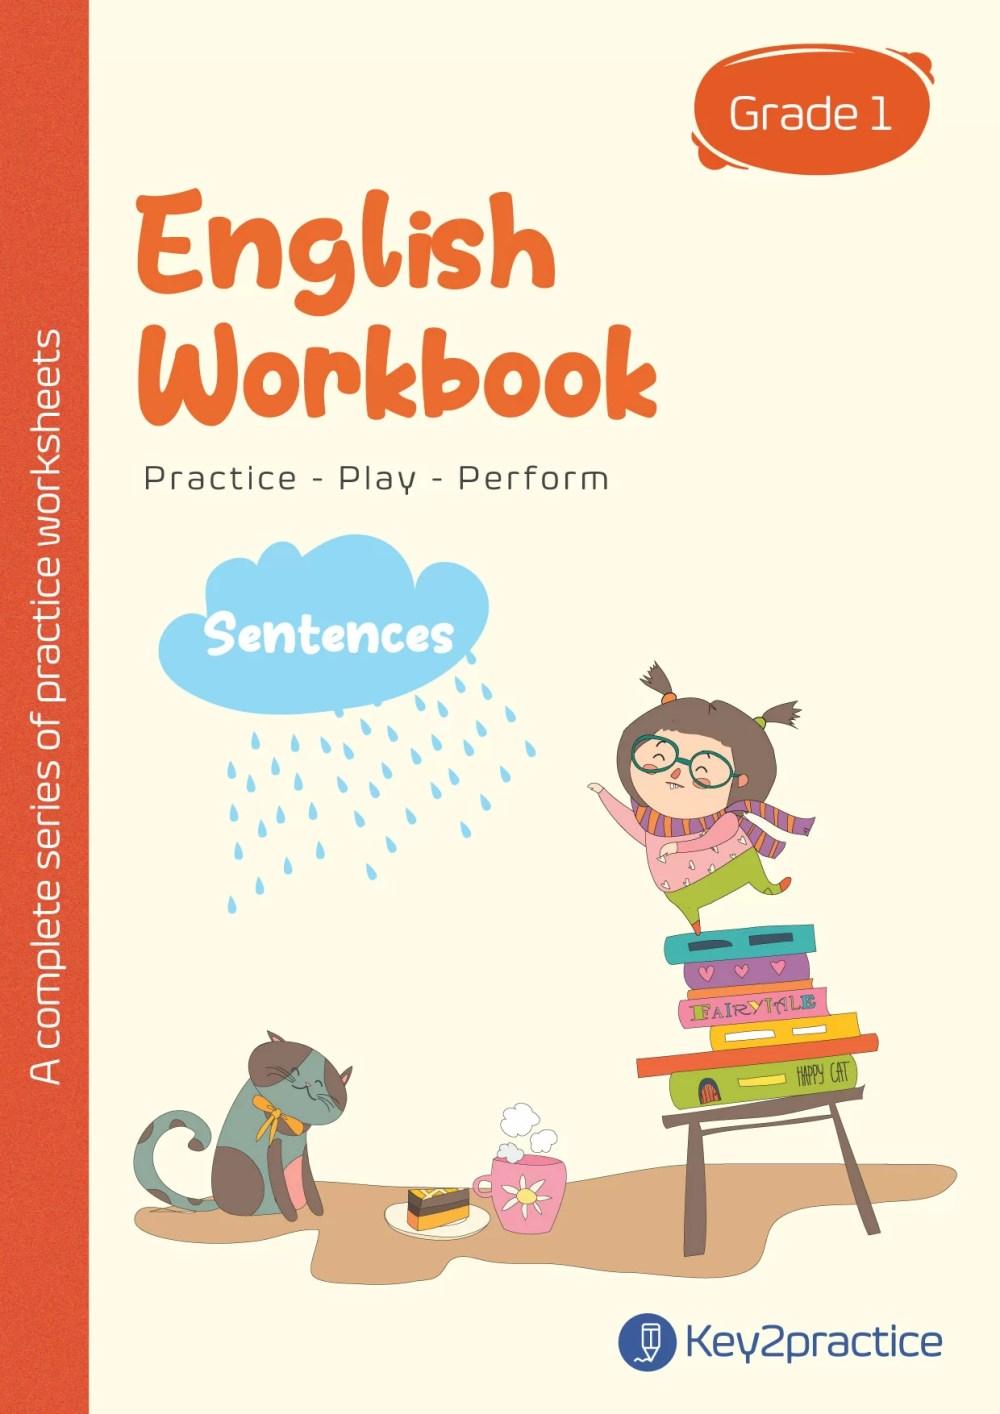 medium resolution of English Punctuation Grade 1 I Sentences - key2practice Workbooks